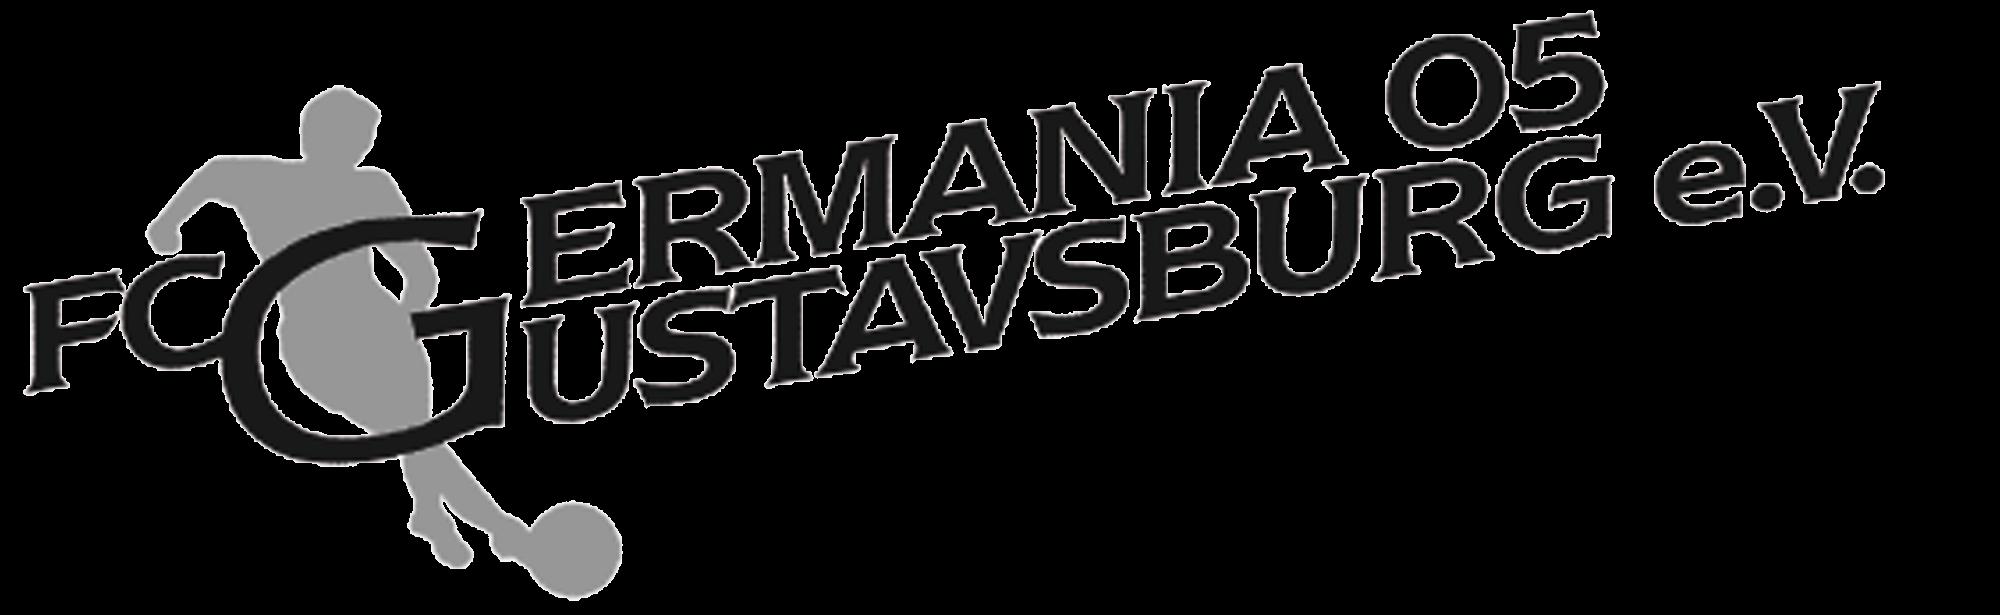 F.C. Germania 1905 Gustavsburg e.V.